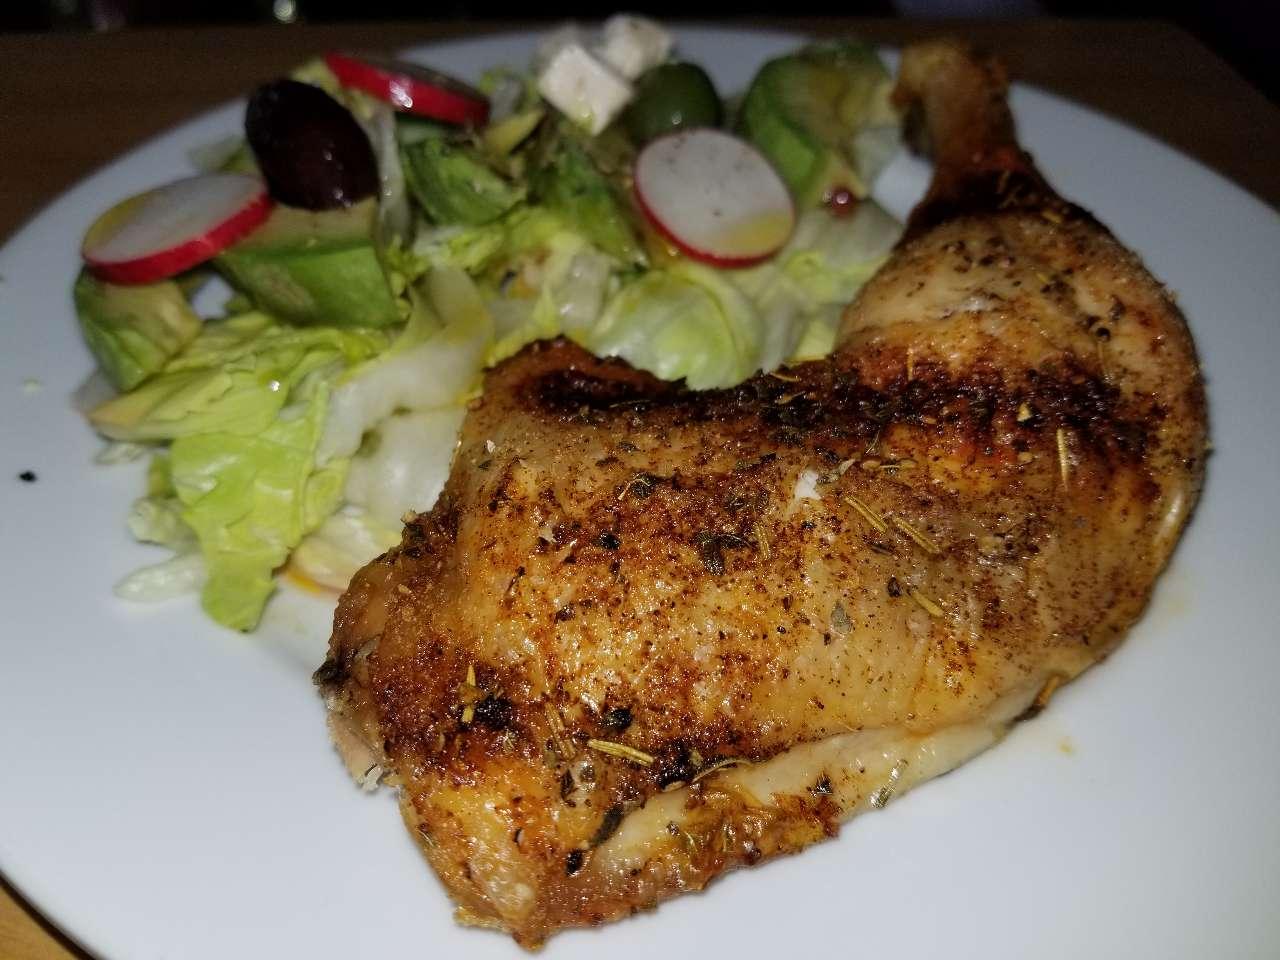 Happy Sunday Quick Simple Dinner Tonightbaked Chicken Leg Quarter